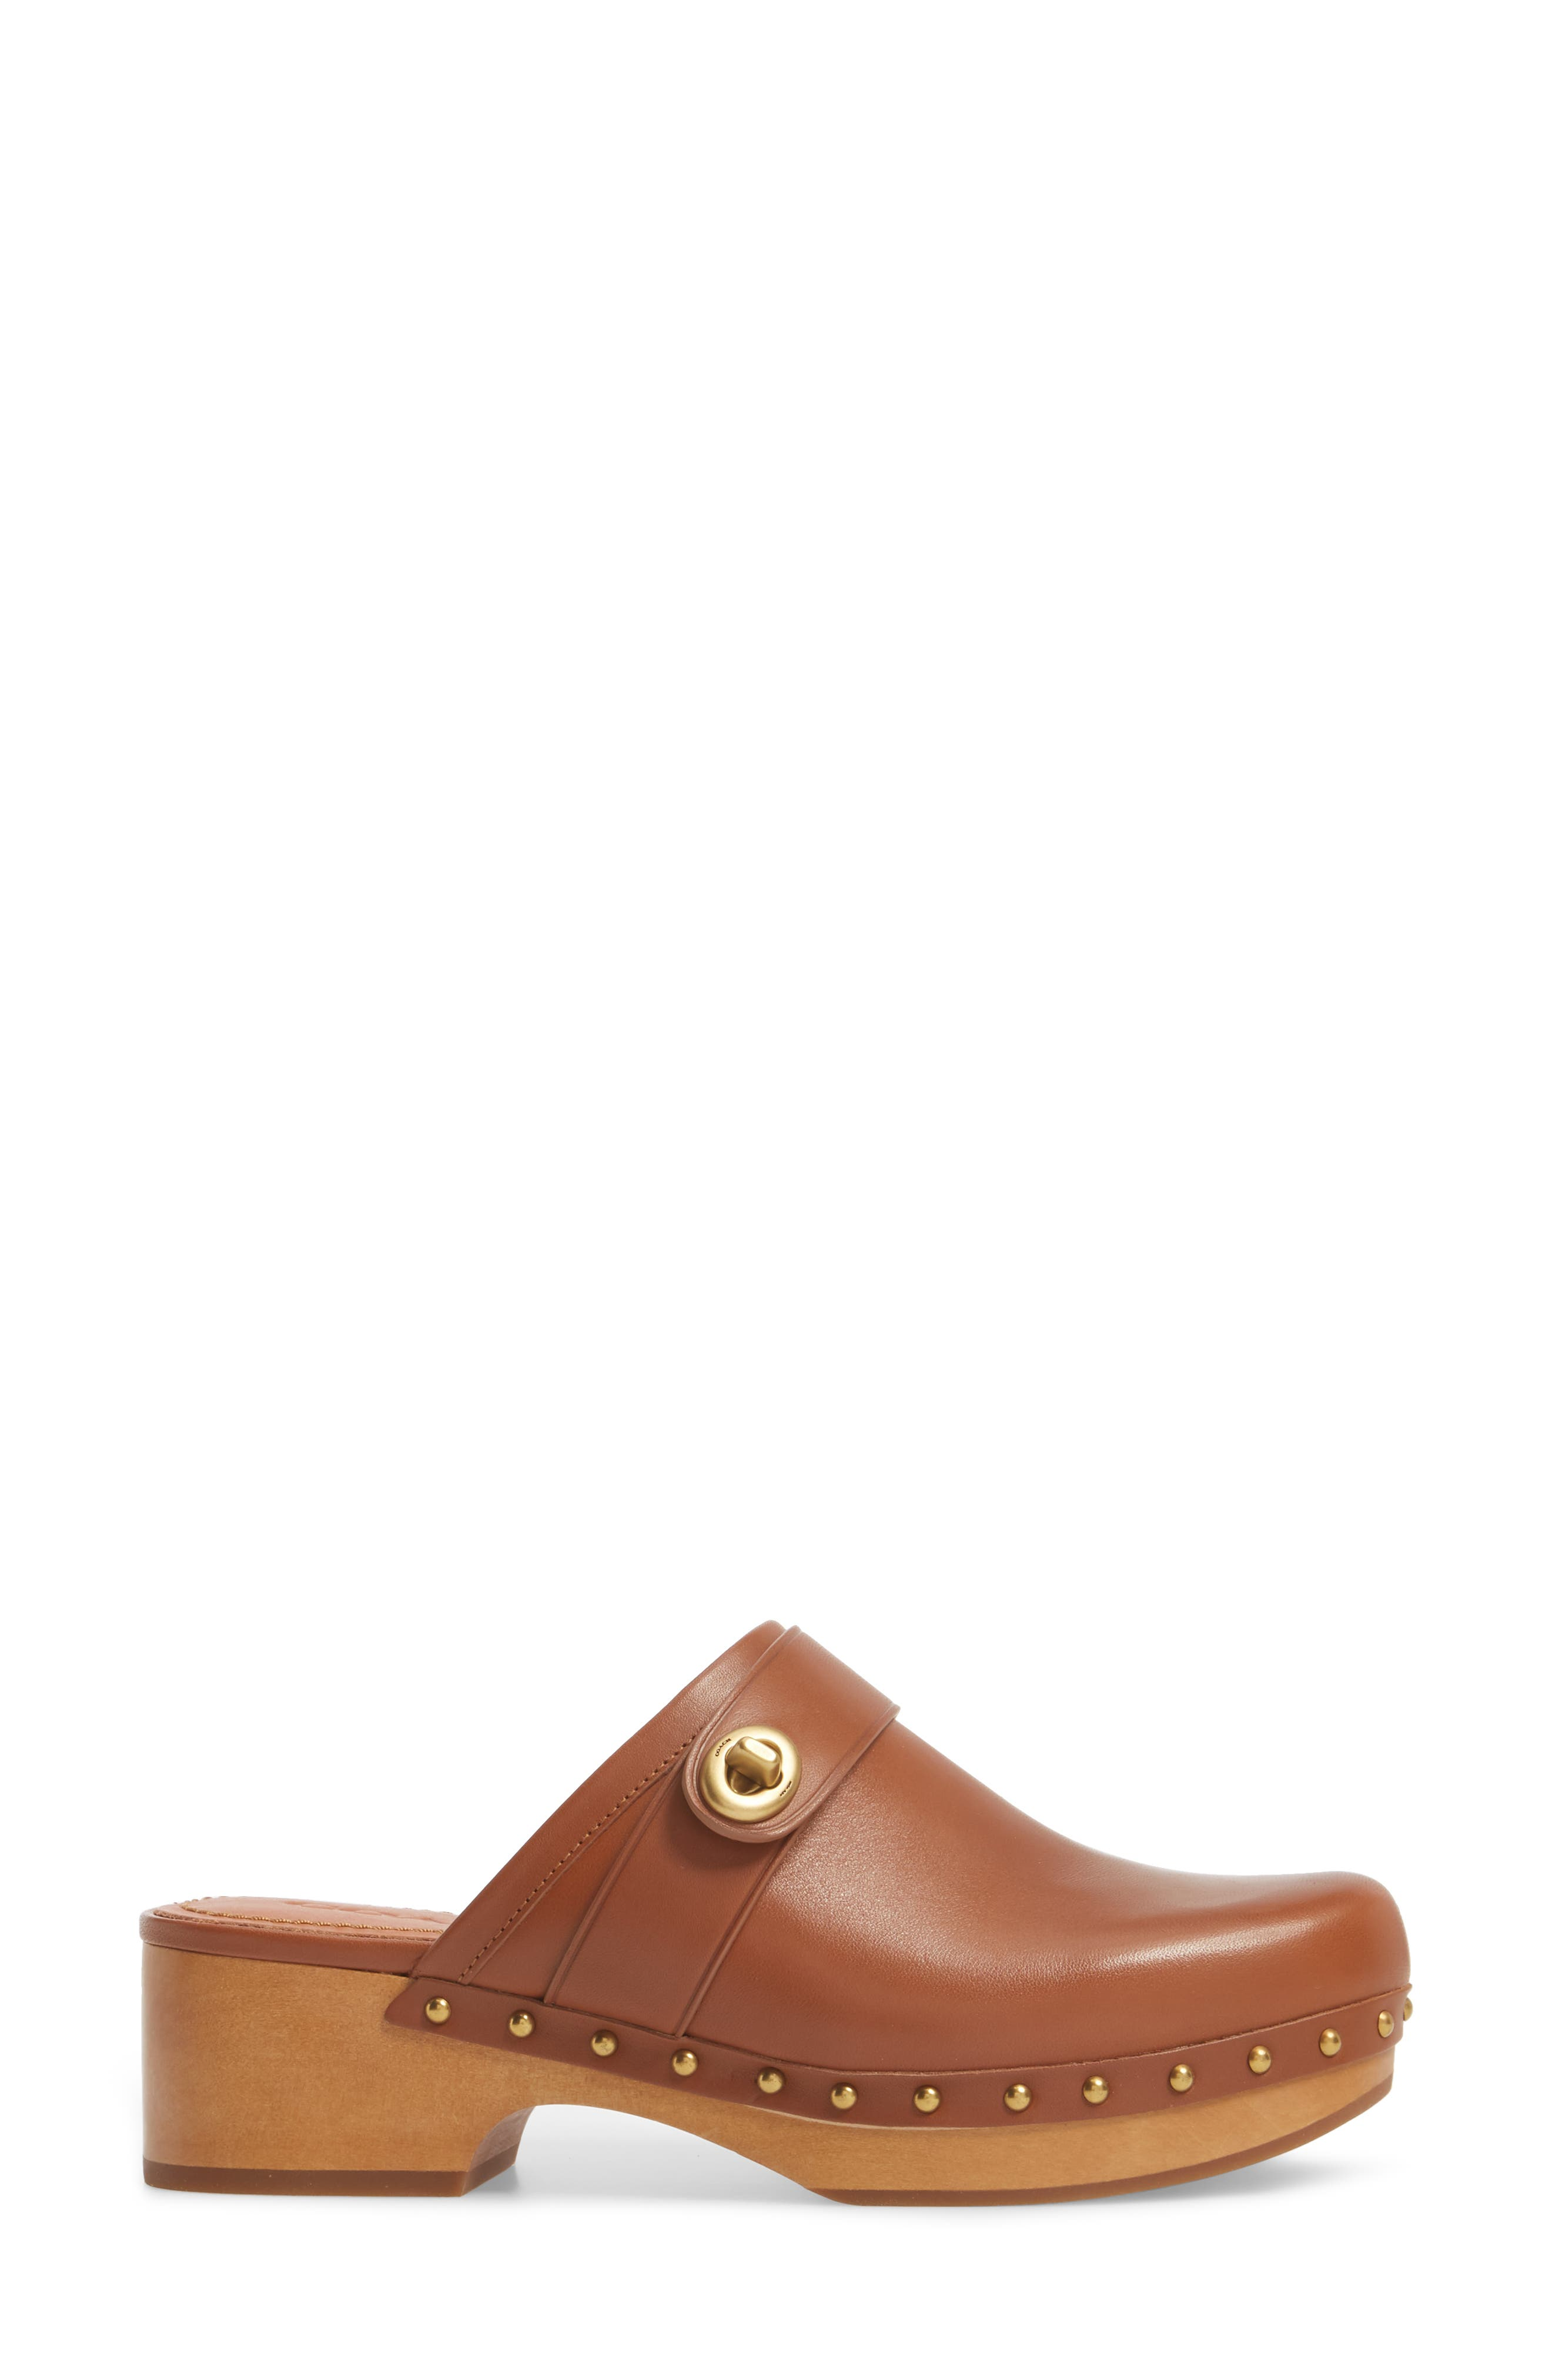 Turnlock Clog,                             Alternate thumbnail 3, color,                             Saddle Leather